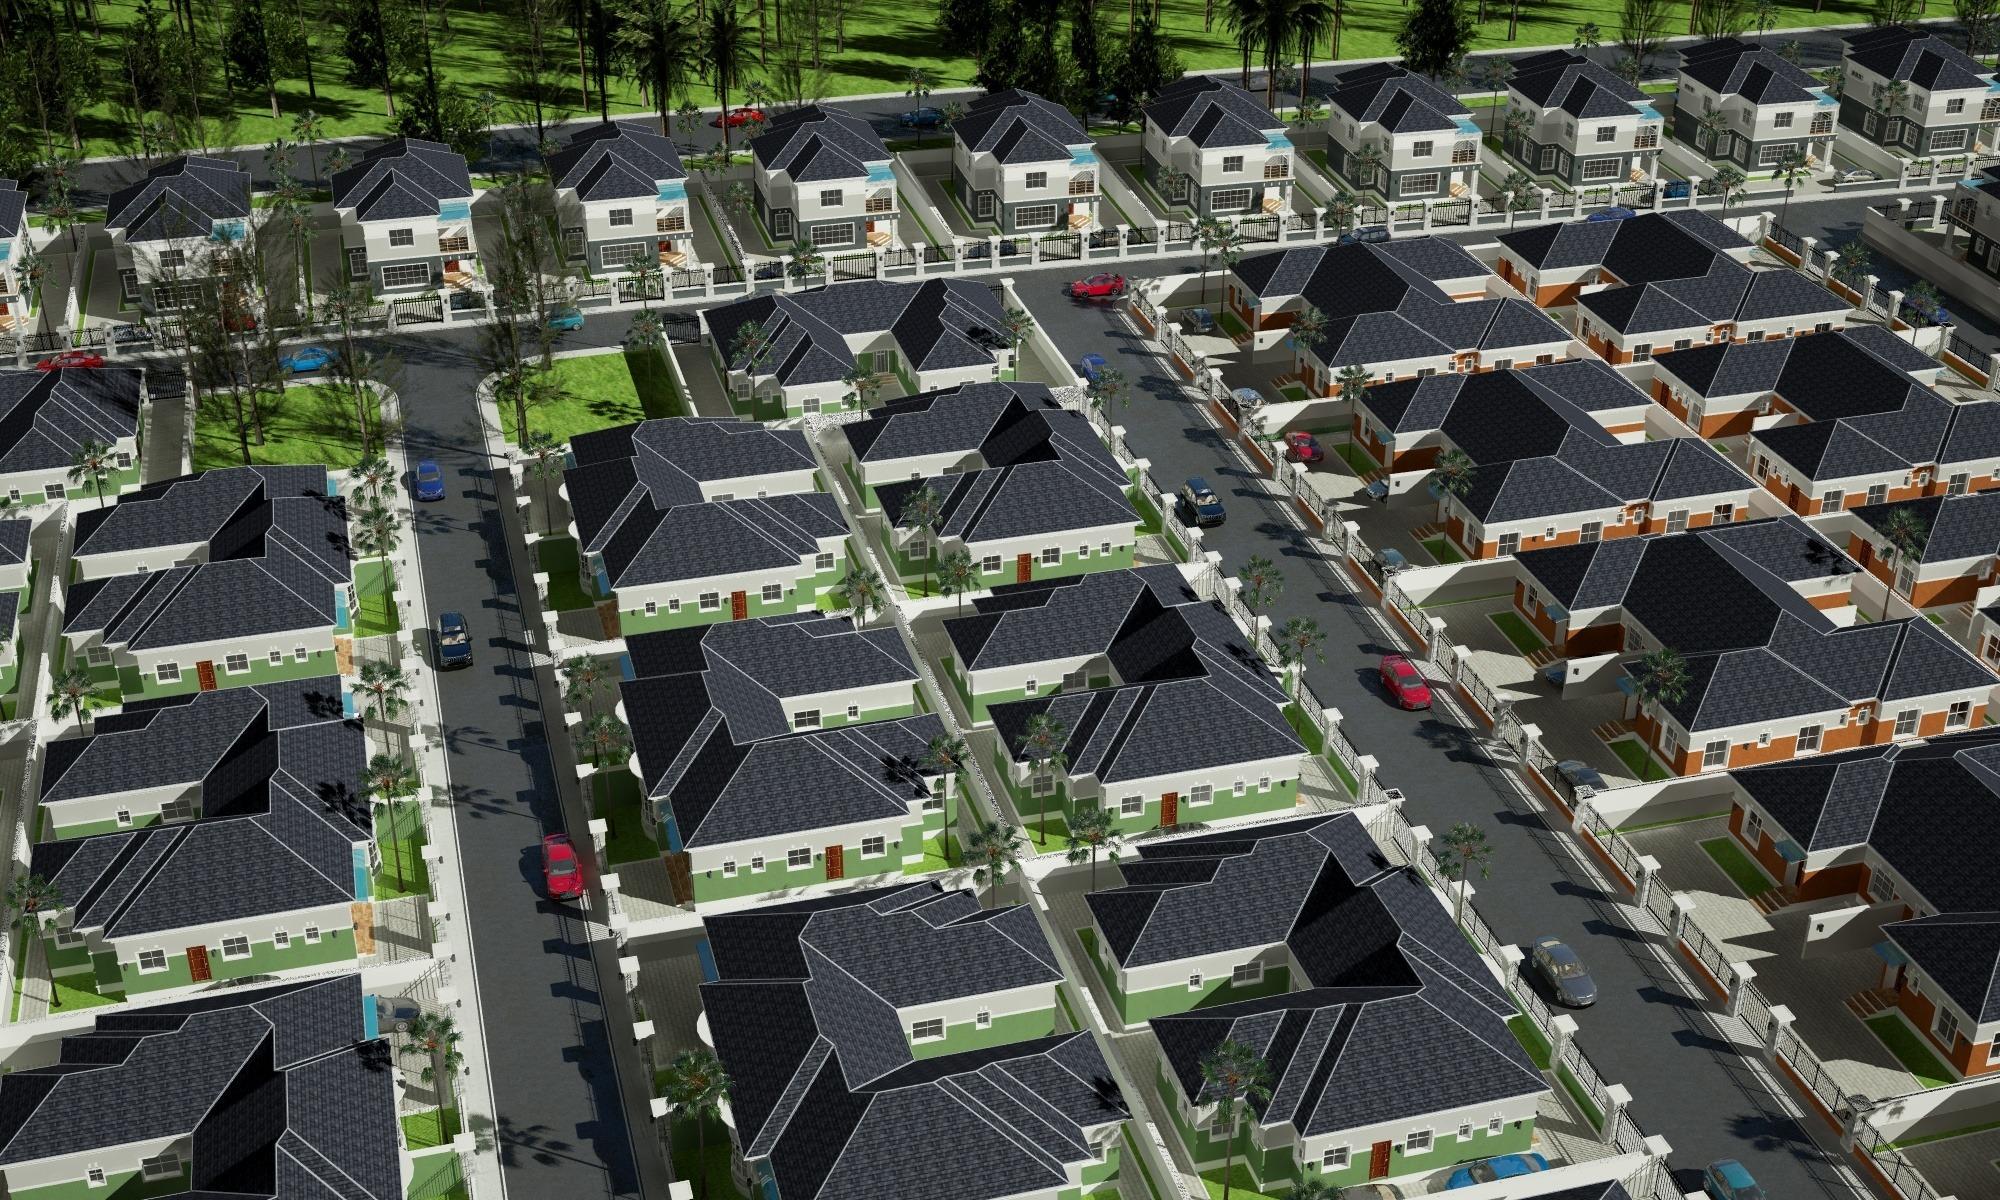 dantata housing estate kubuwa phase ii - dantata town developers